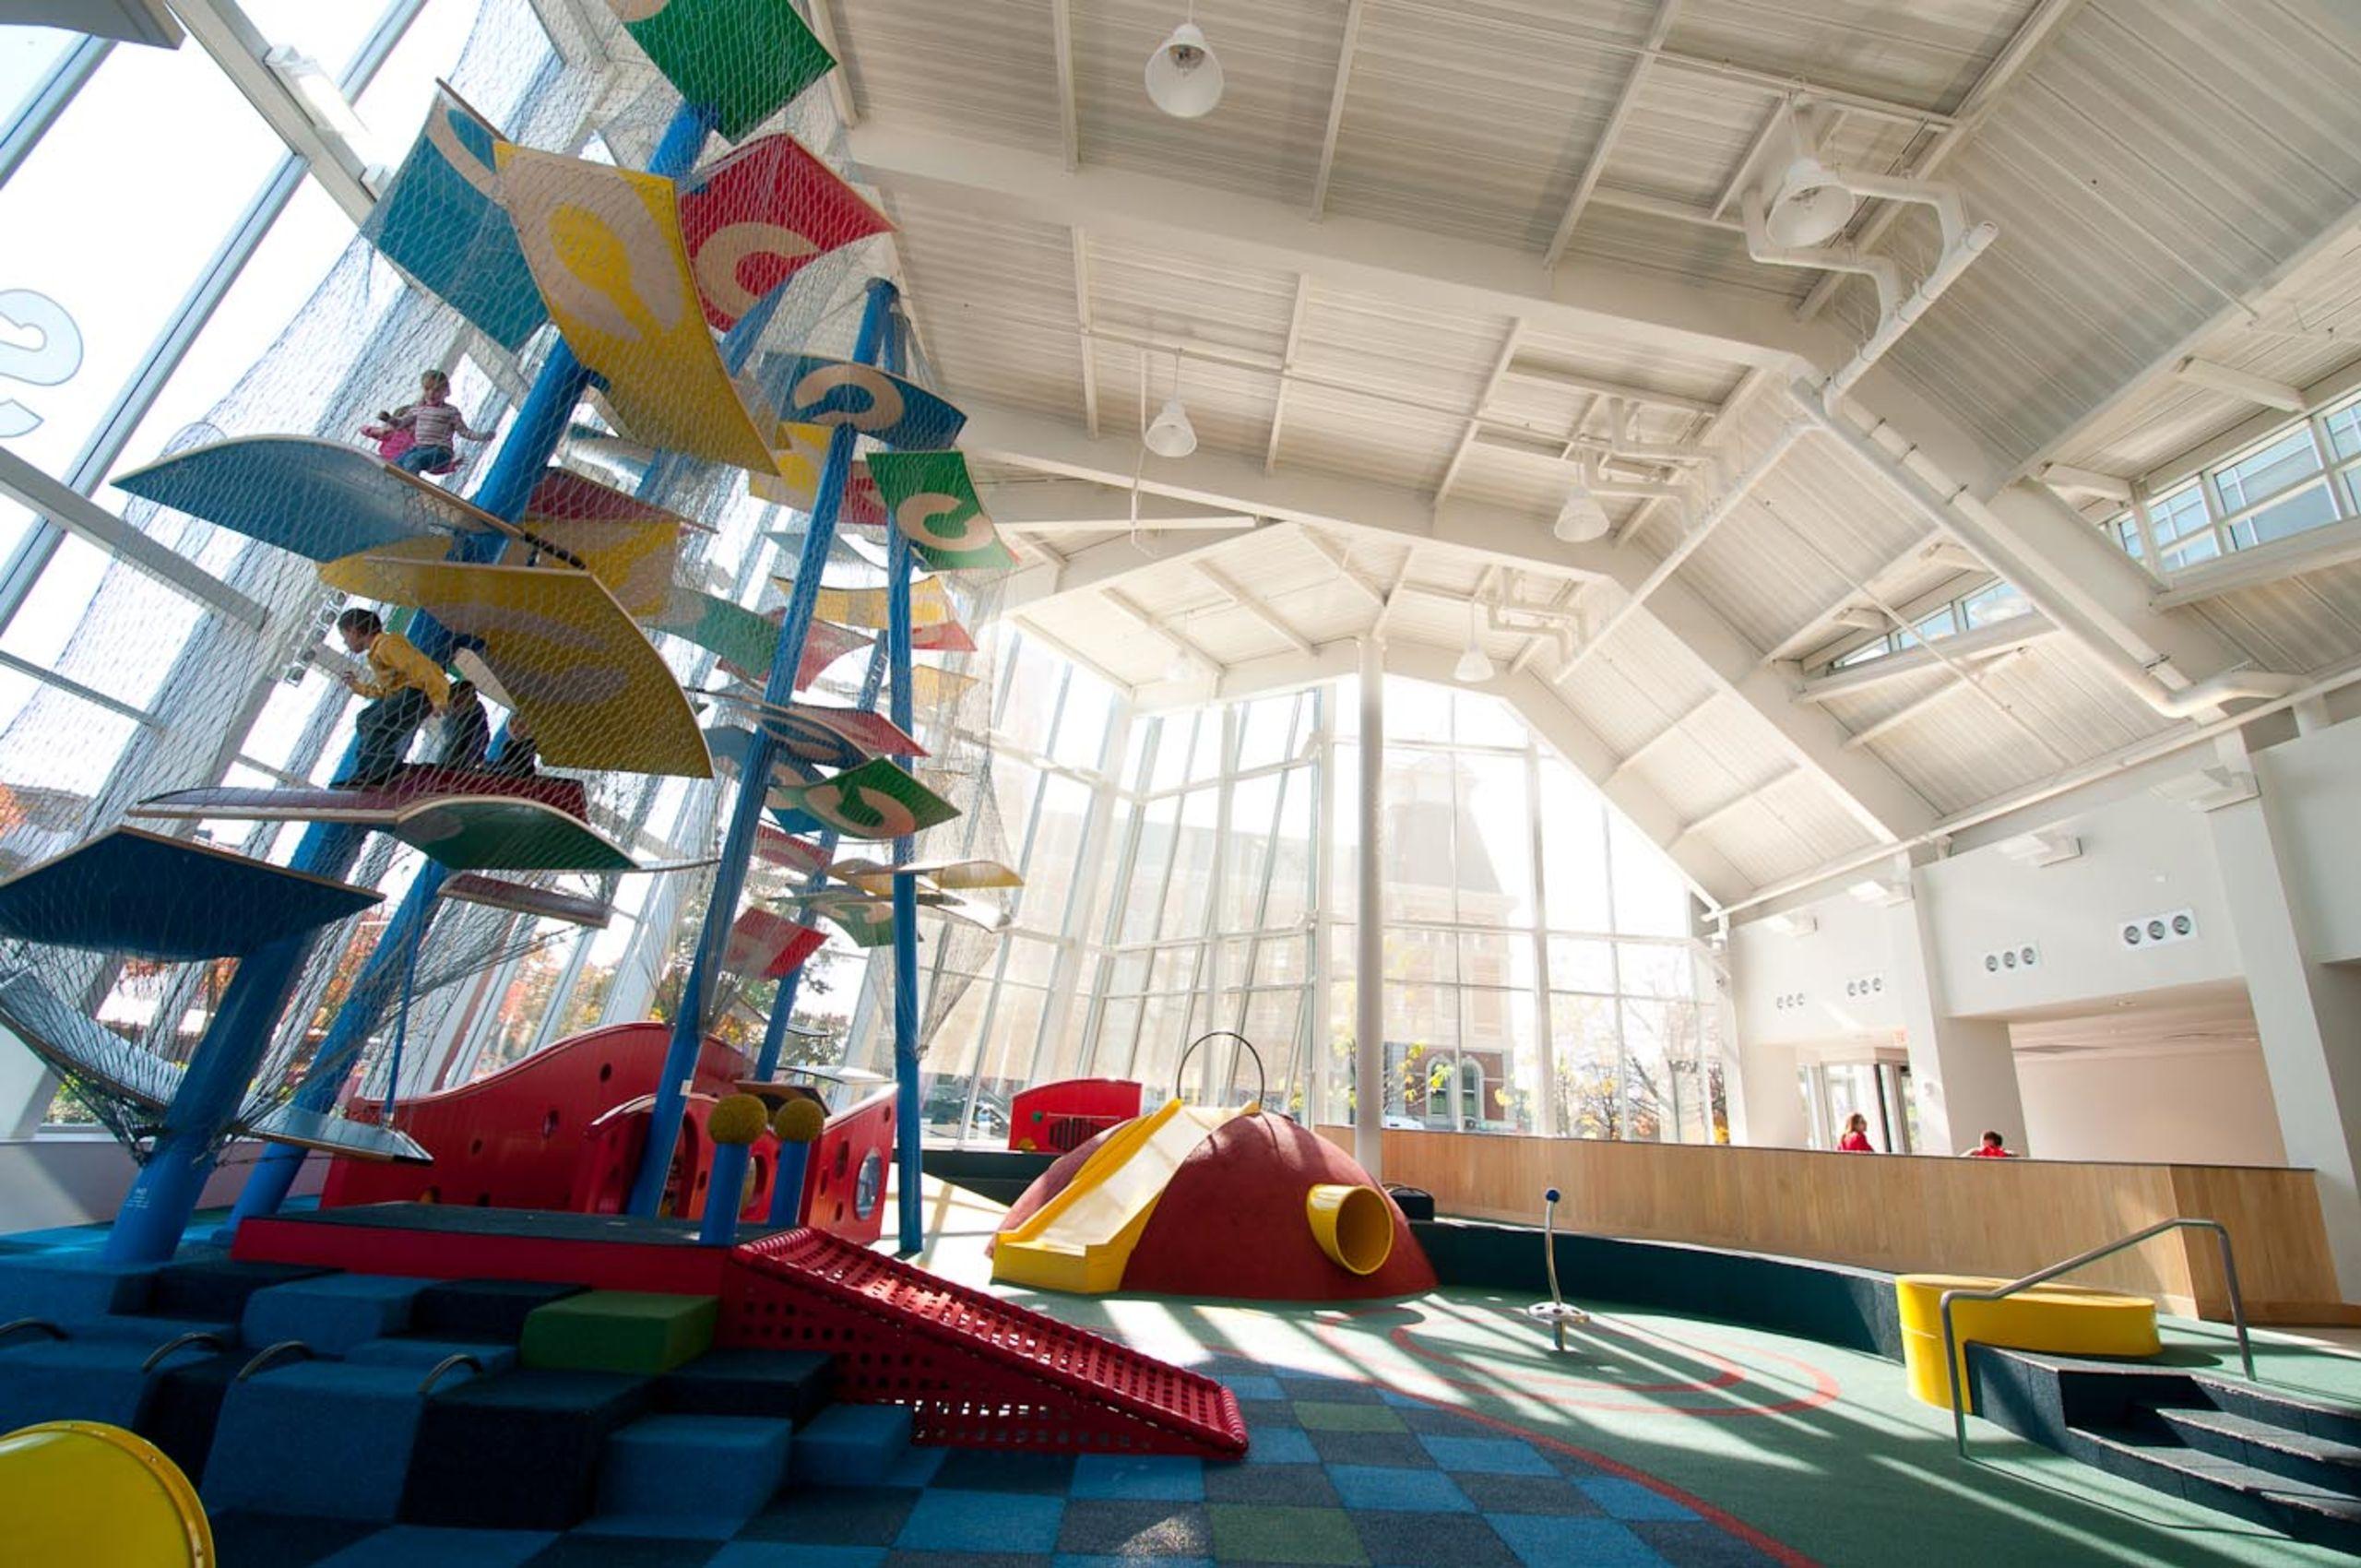 Commons Indoor Playground